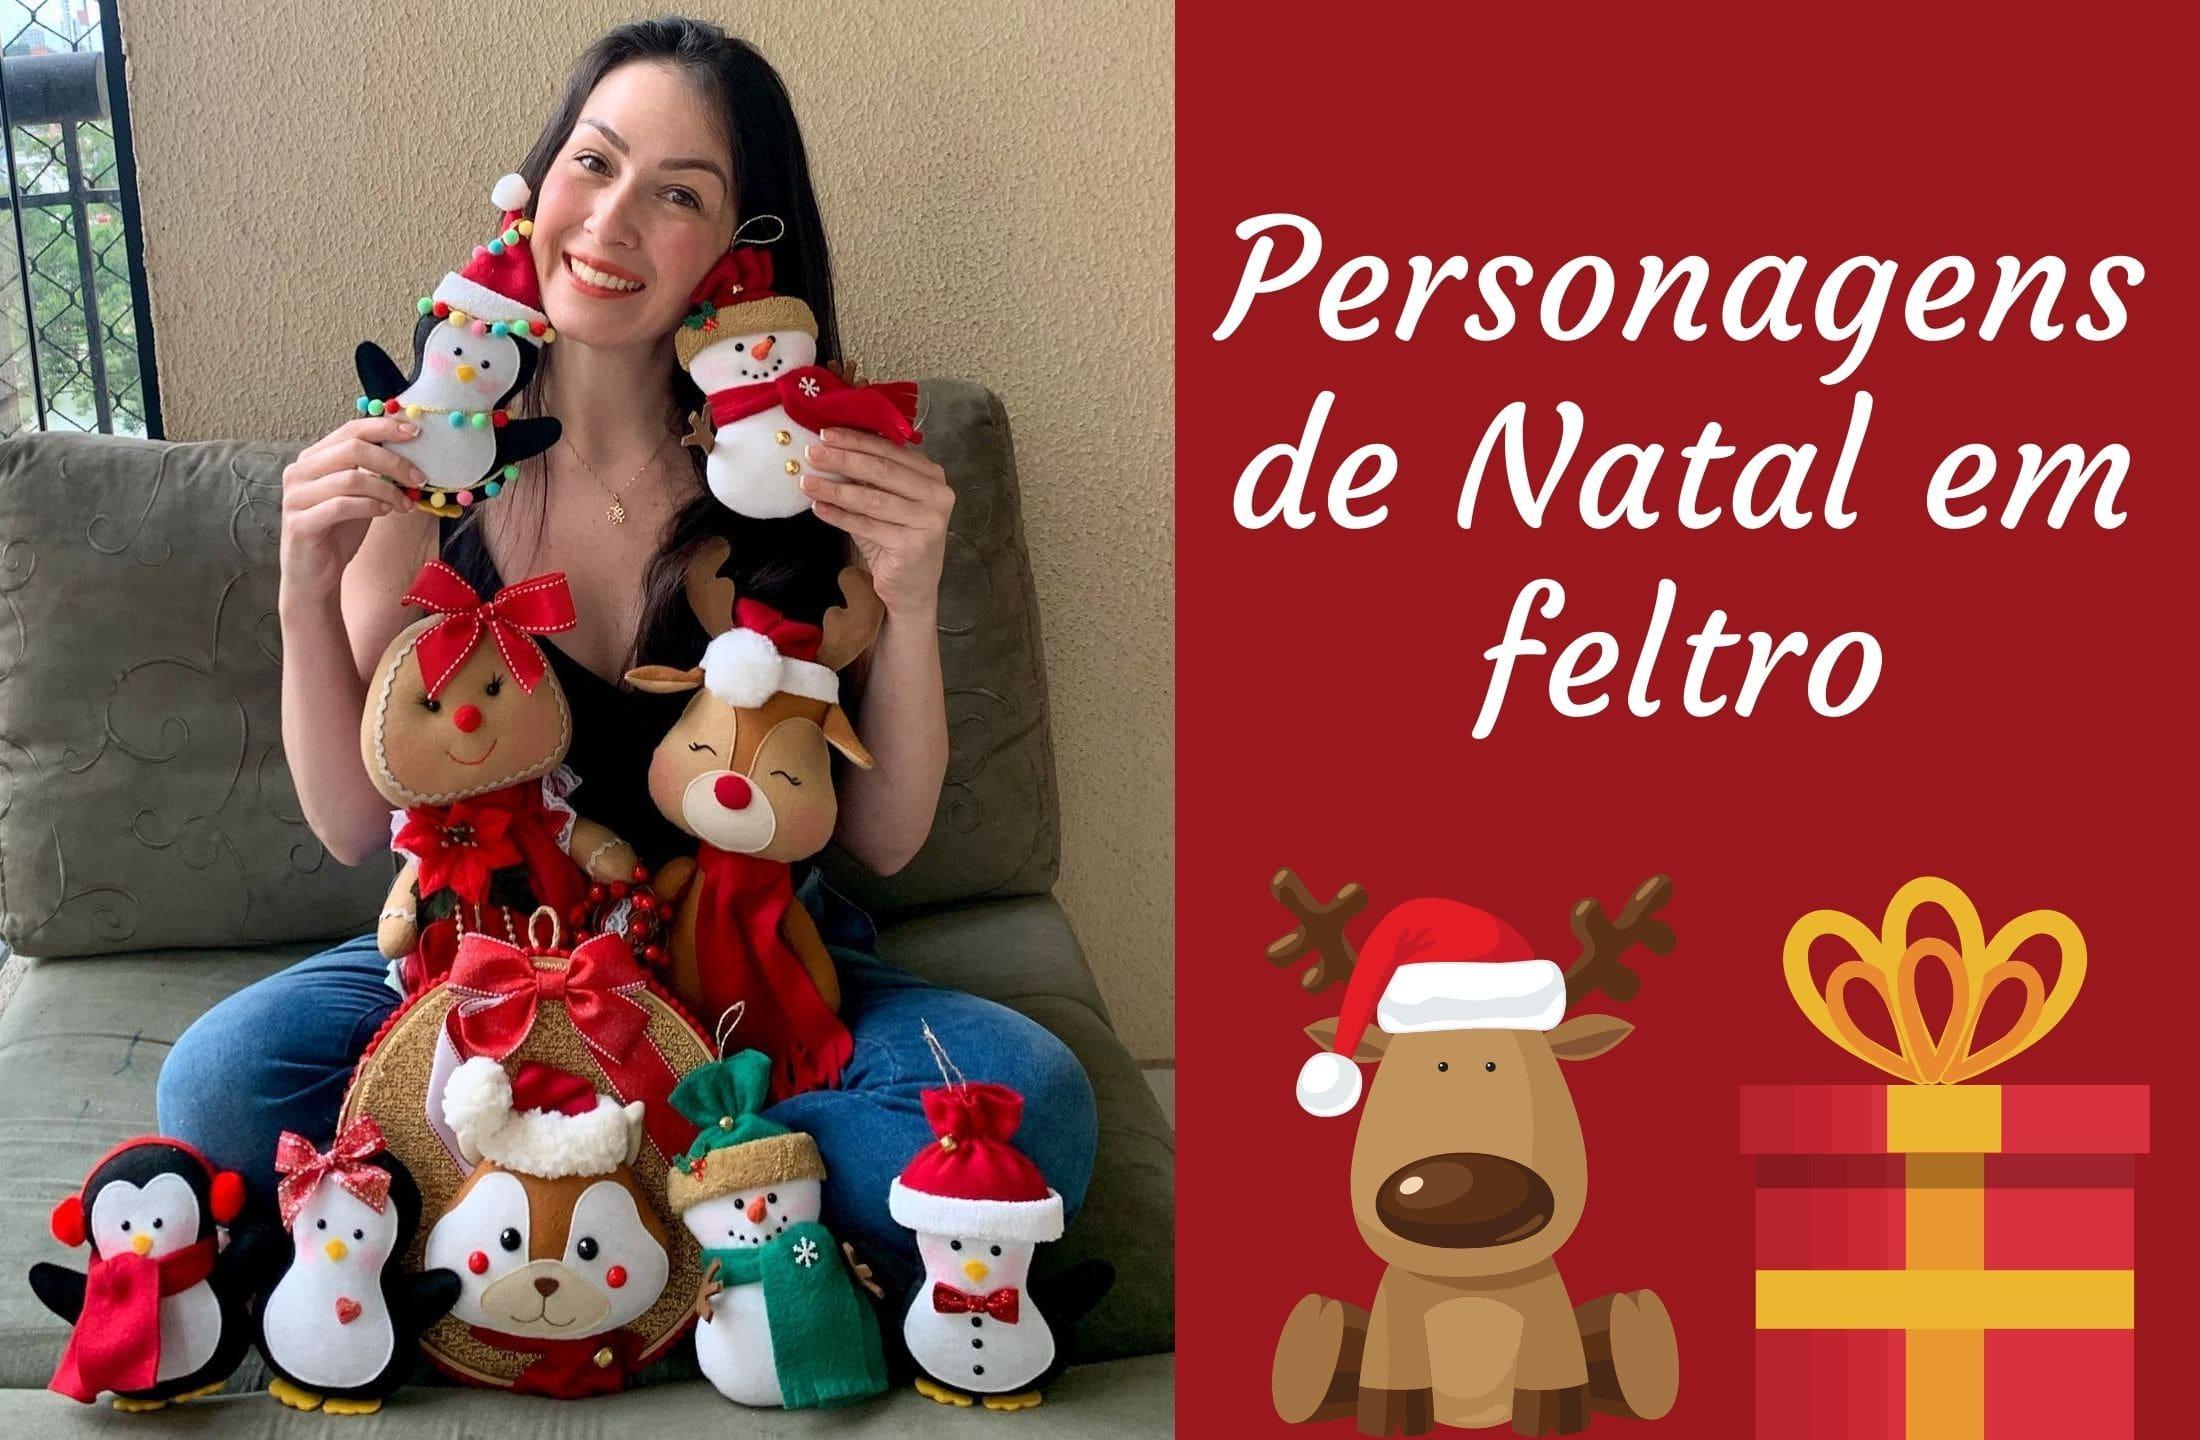 Personagem de Natal em feltro – Natal 2020